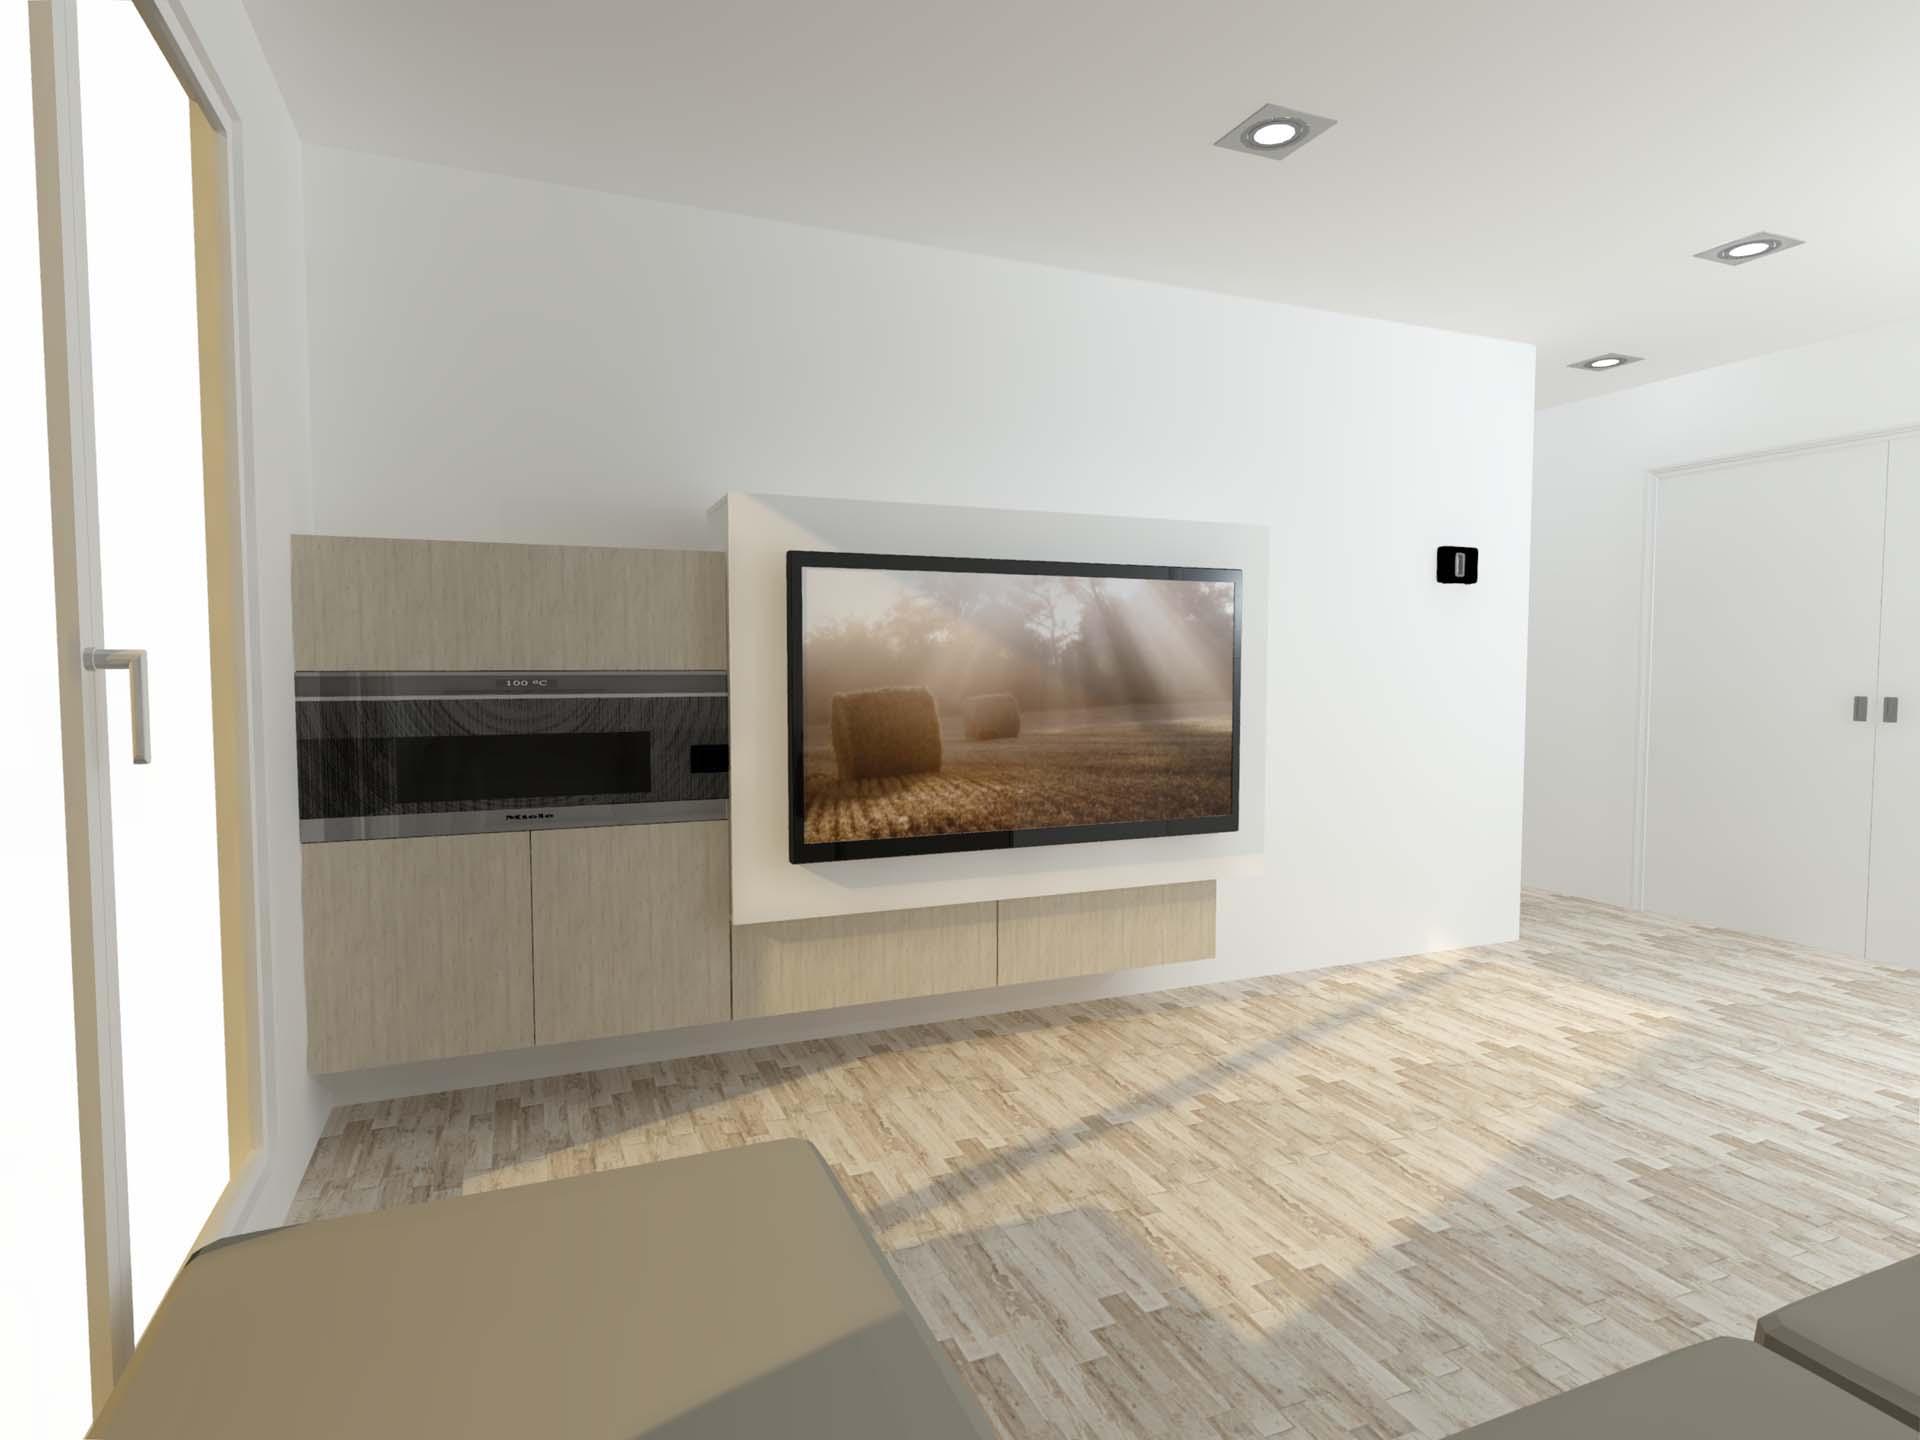 Sal n con chimenea y tv colgada arnit for Decoracion salon con chimenea